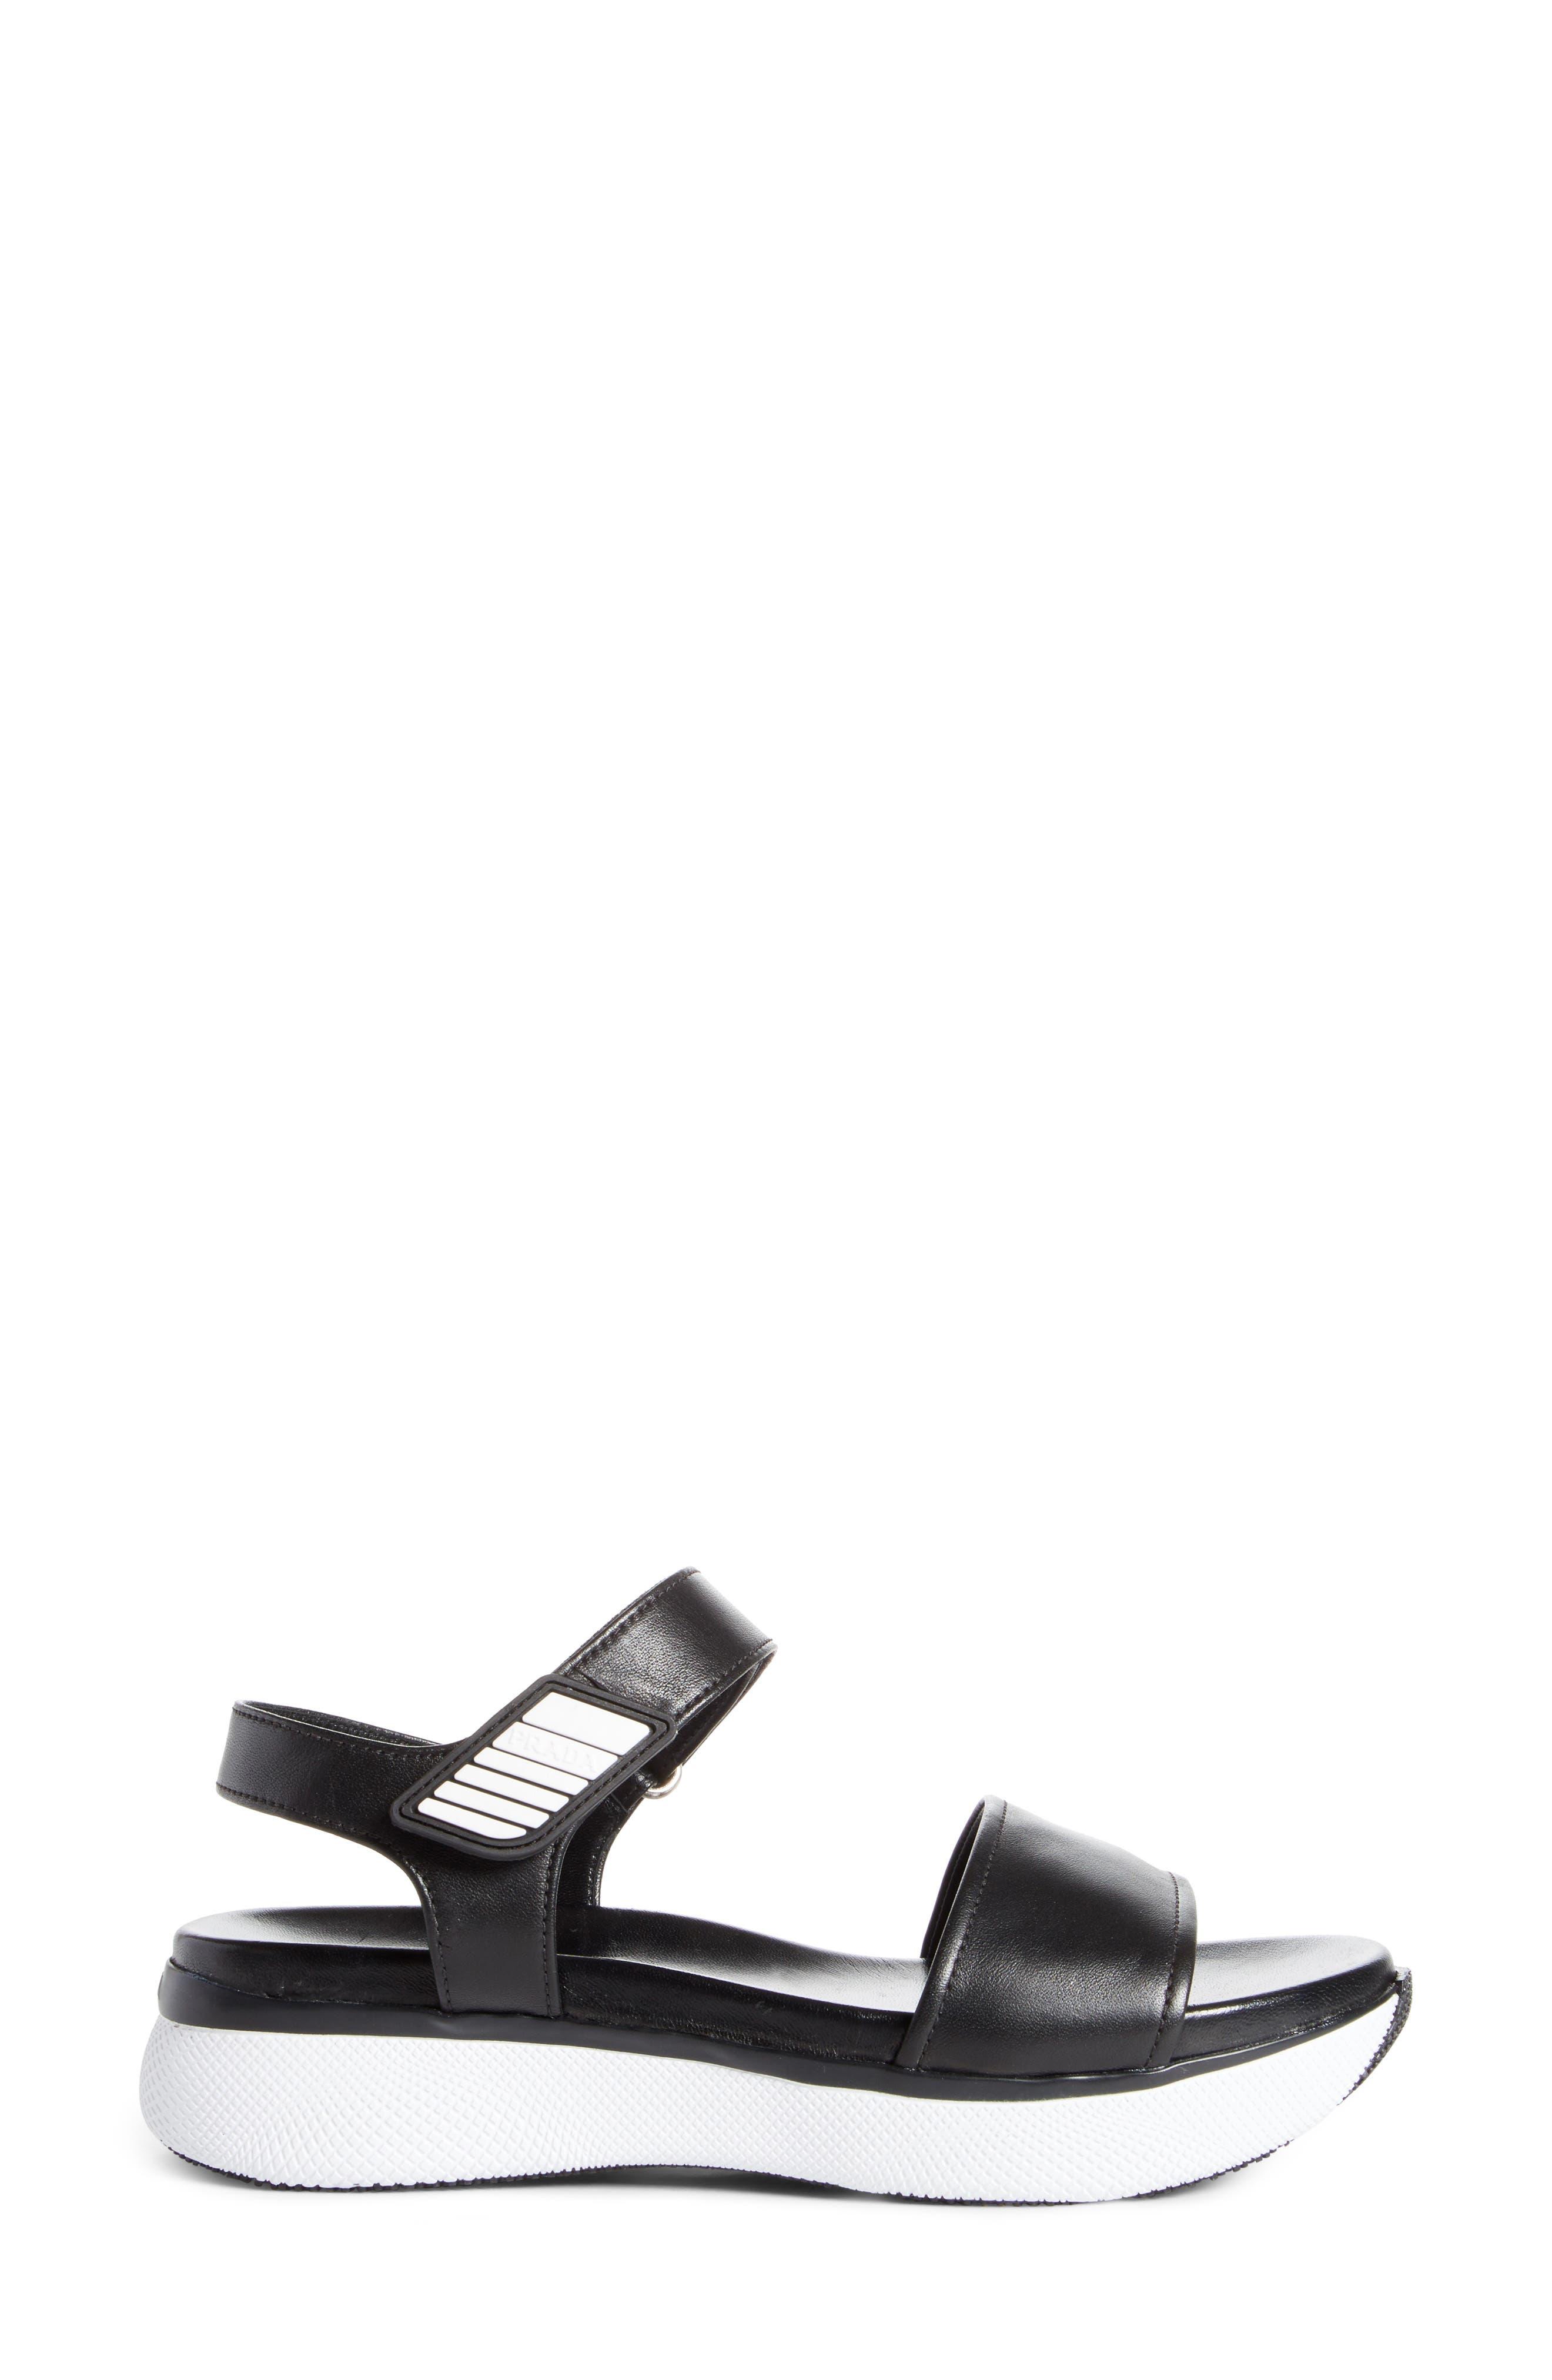 Platform Sandal,                             Alternate thumbnail 3, color,                             Black/ White